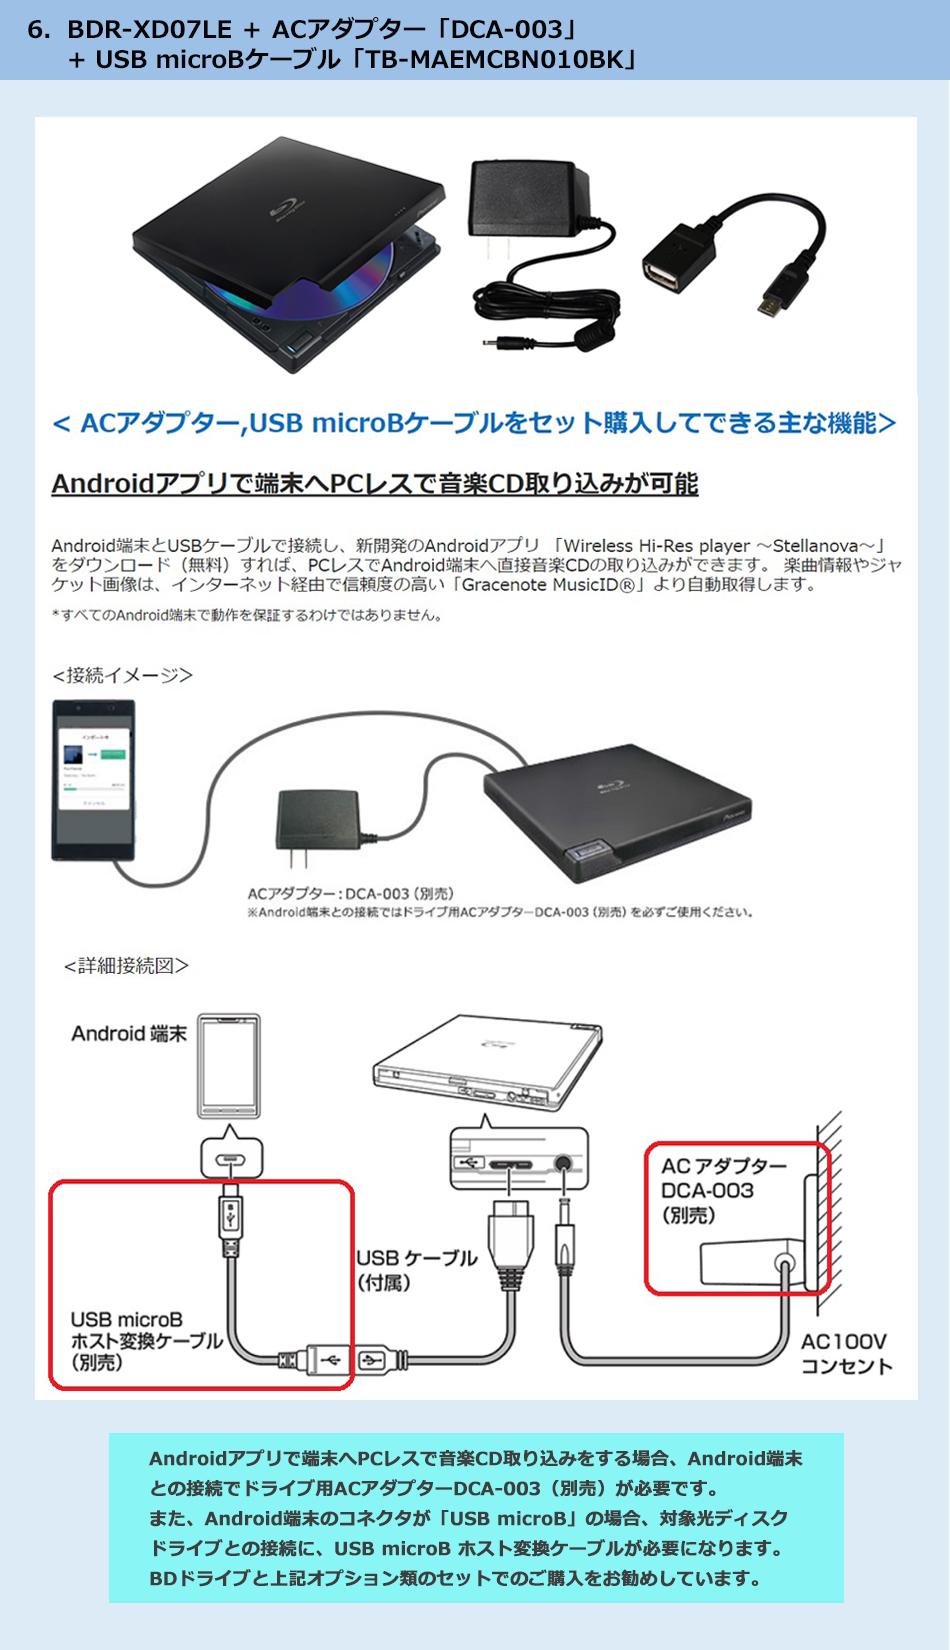 BDR-XD07LE+ACアダプターケーブル+USB microBケーブルセットのご紹介